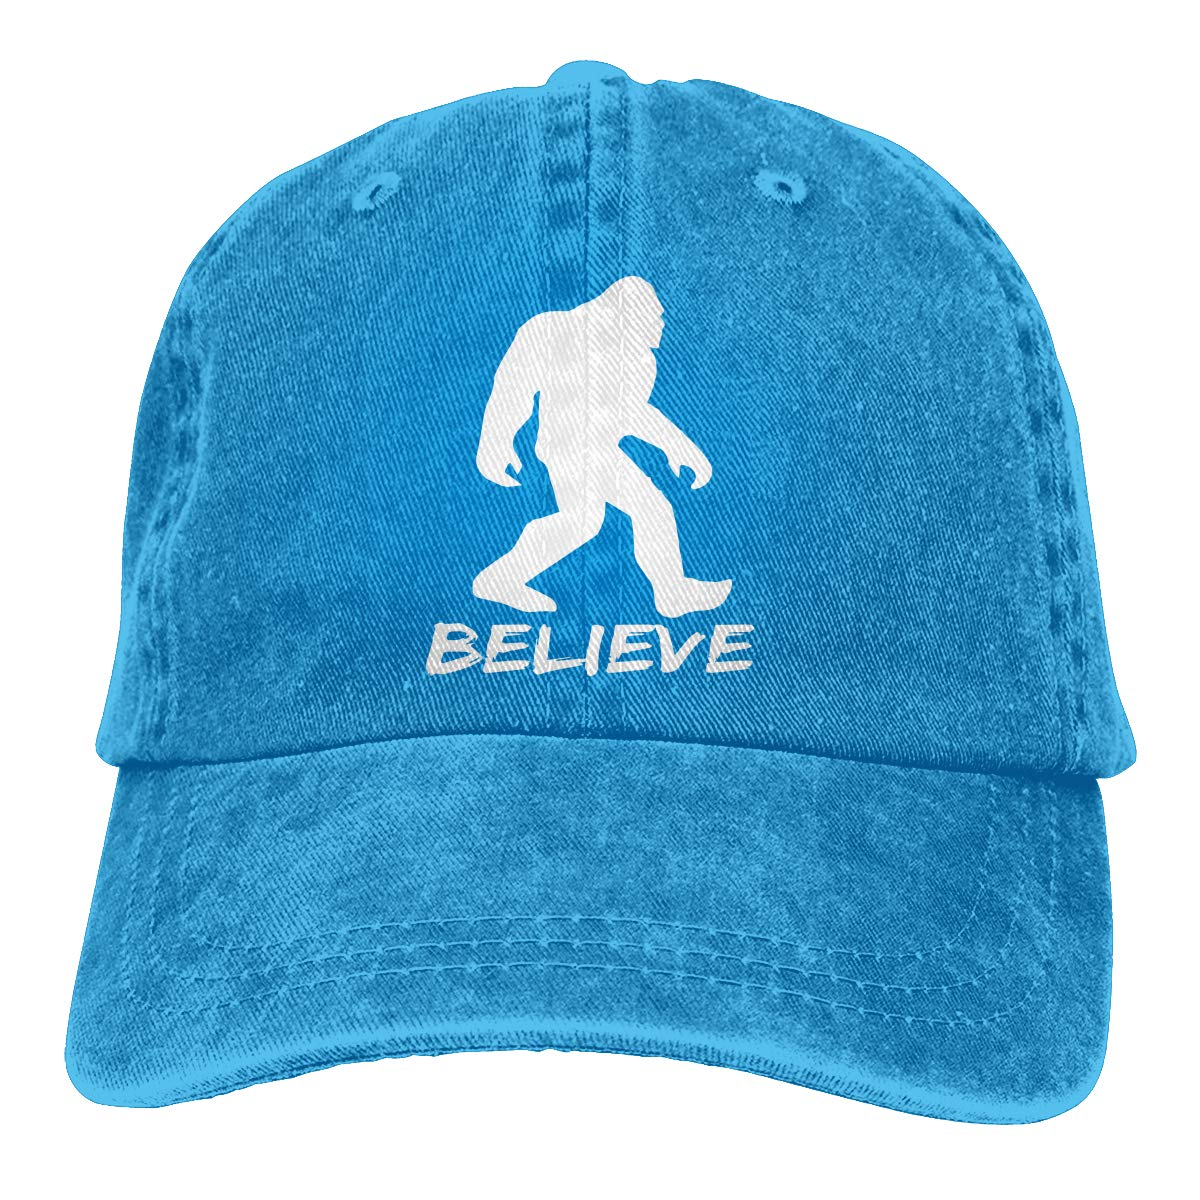 PMGM-C Bigfoot Believe Adult Personalize Cowboy Hip Hop Cap Adjustable Baseball Cap